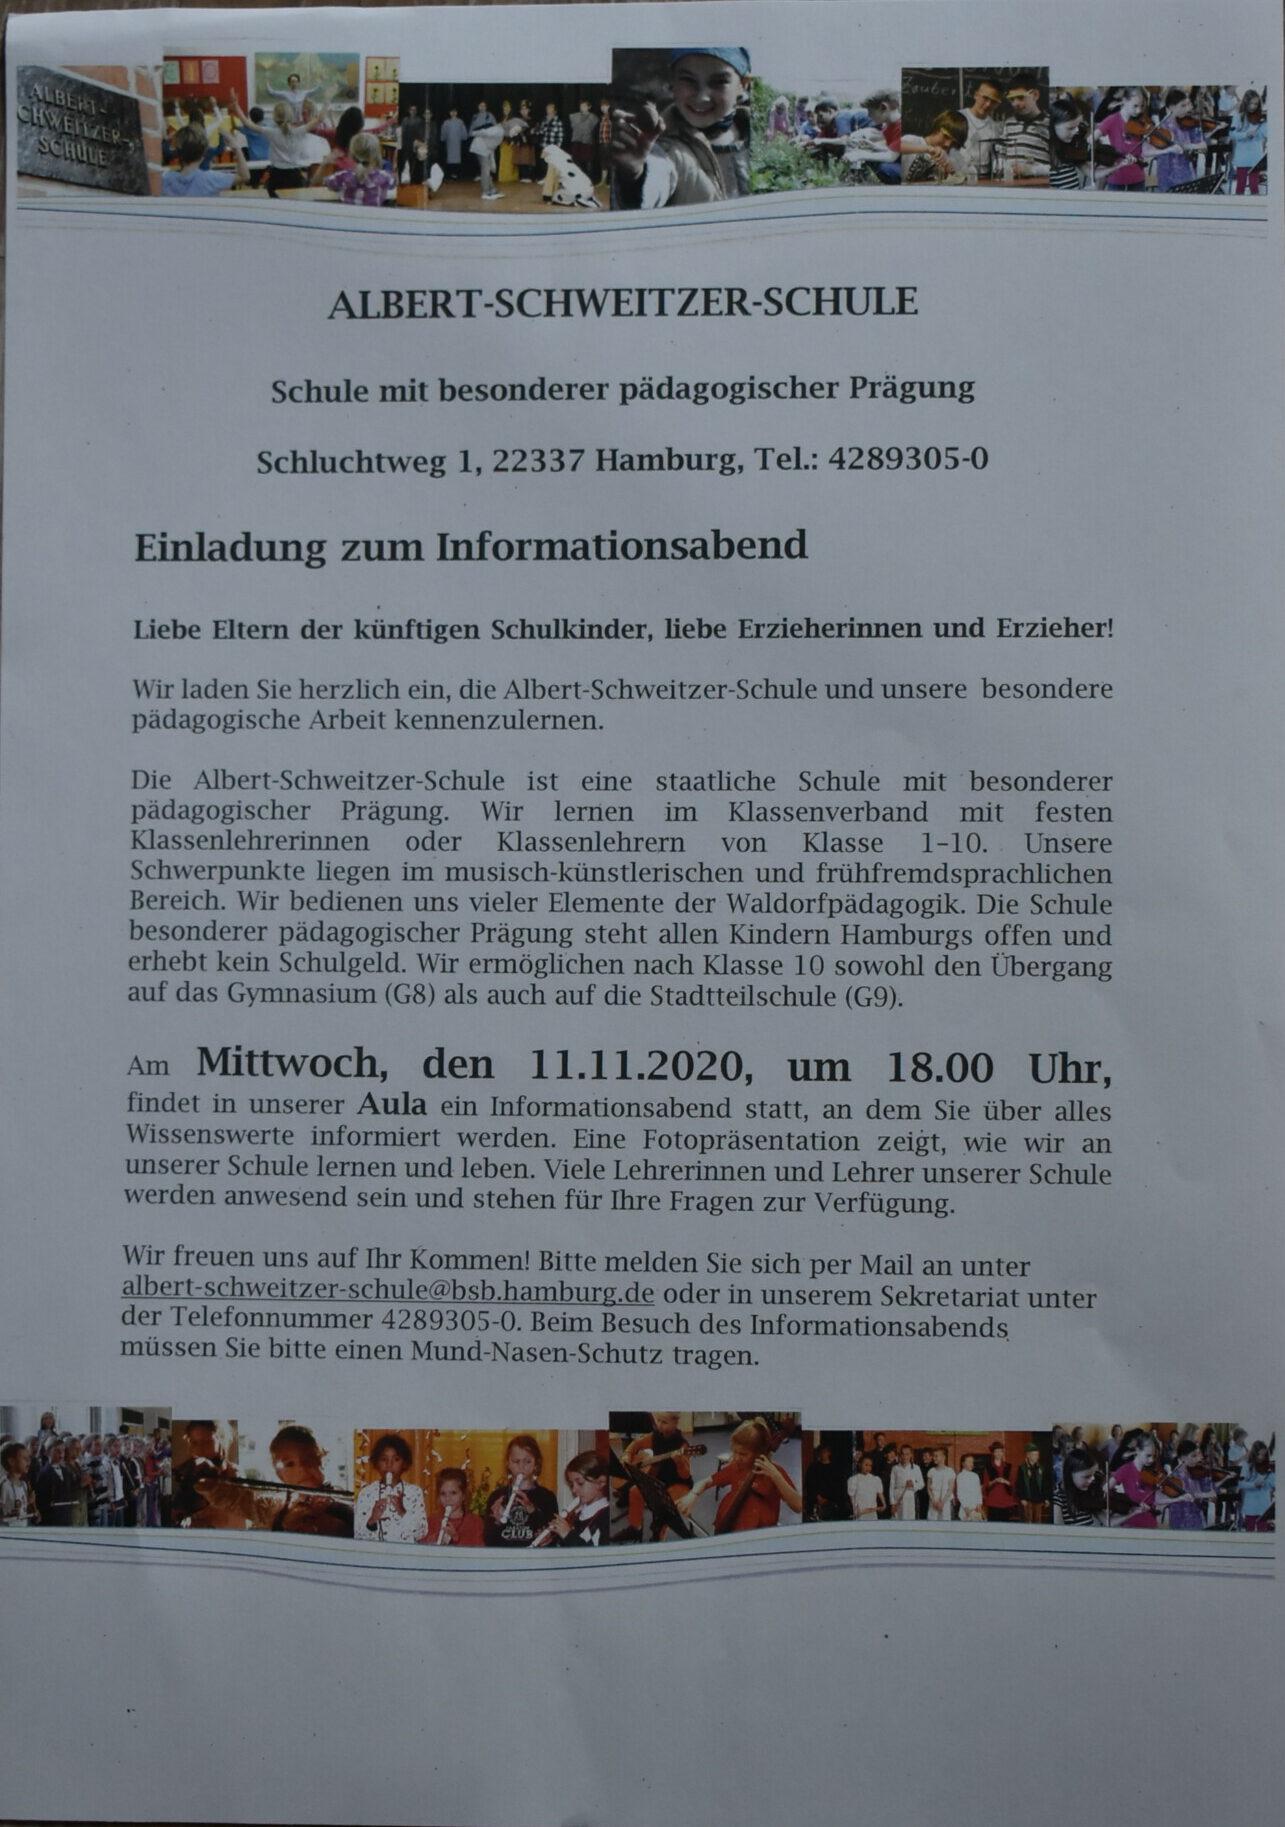 11.11.2020 Informationsabend (Schule mit bes. päd. Prägung)